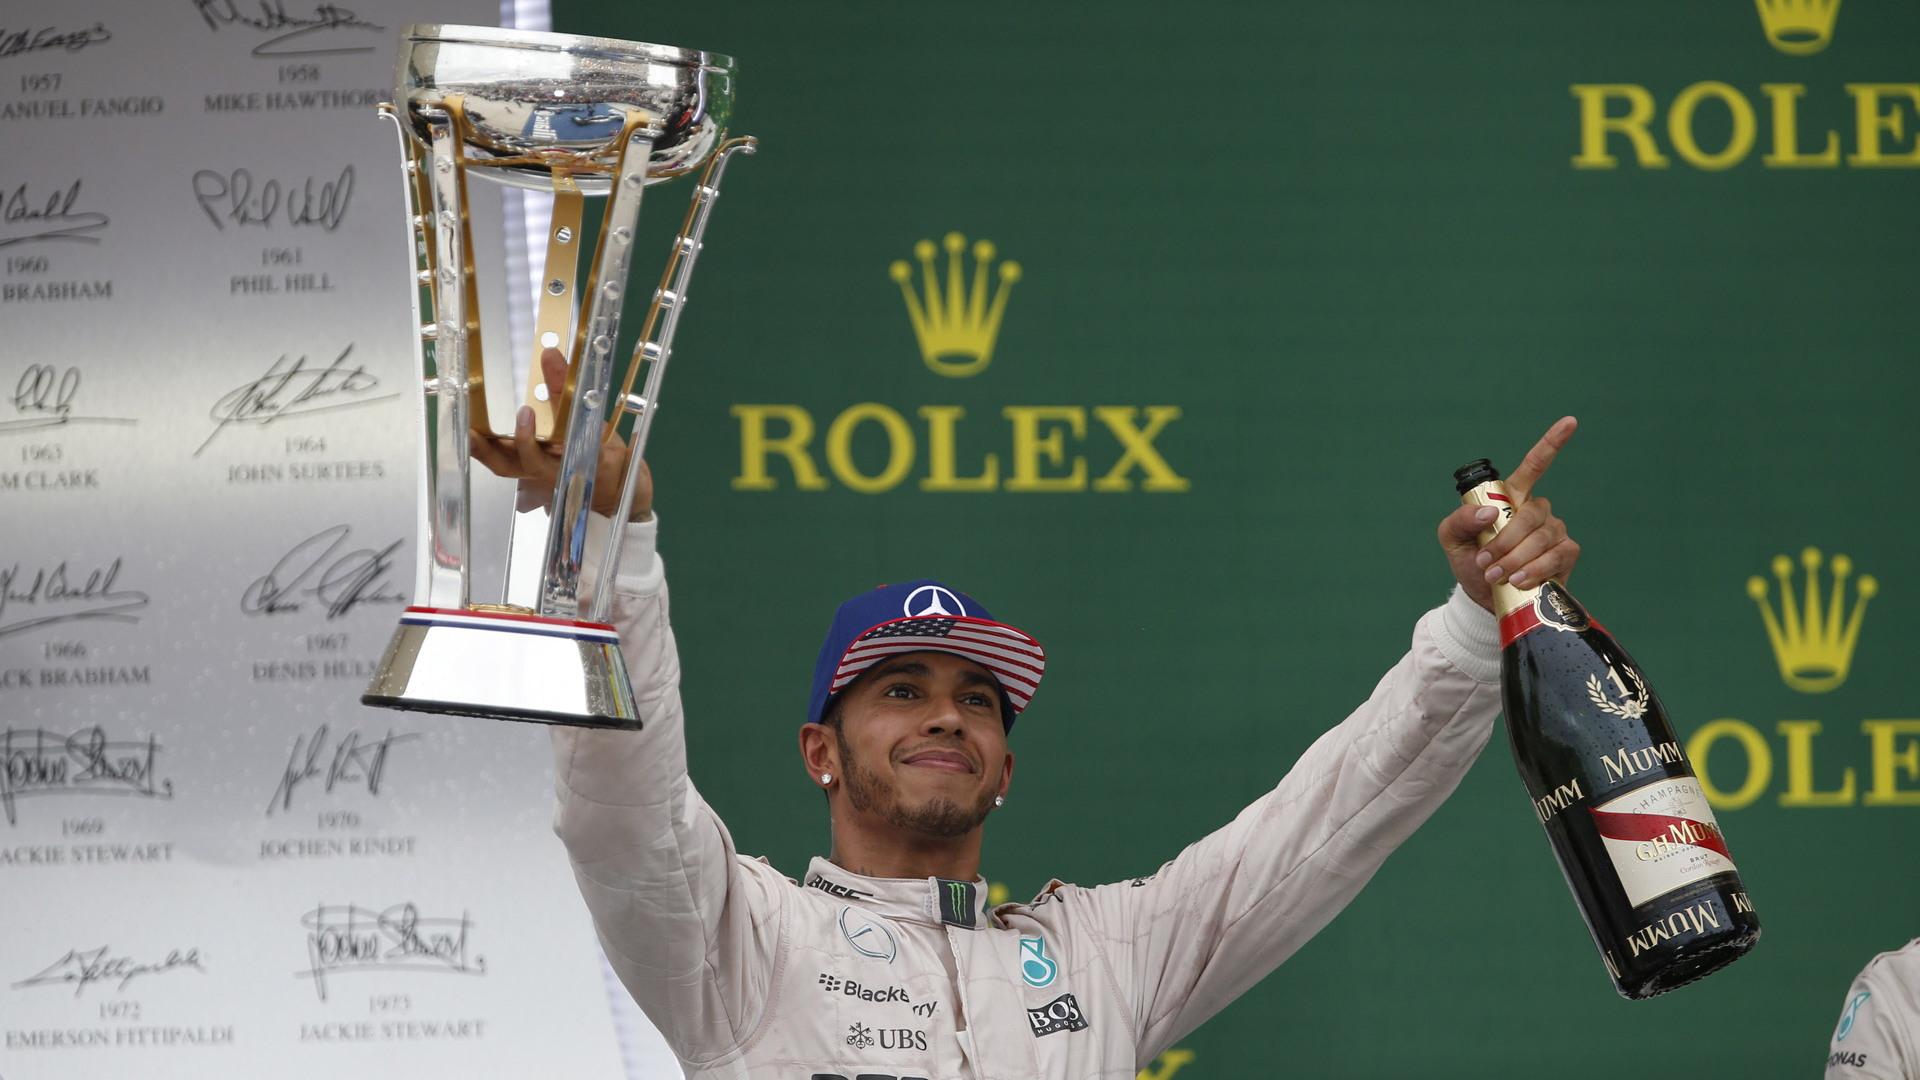 Mercedes AMG's Lewis Hamilton at the 2015 Formula One United States Grand Prix